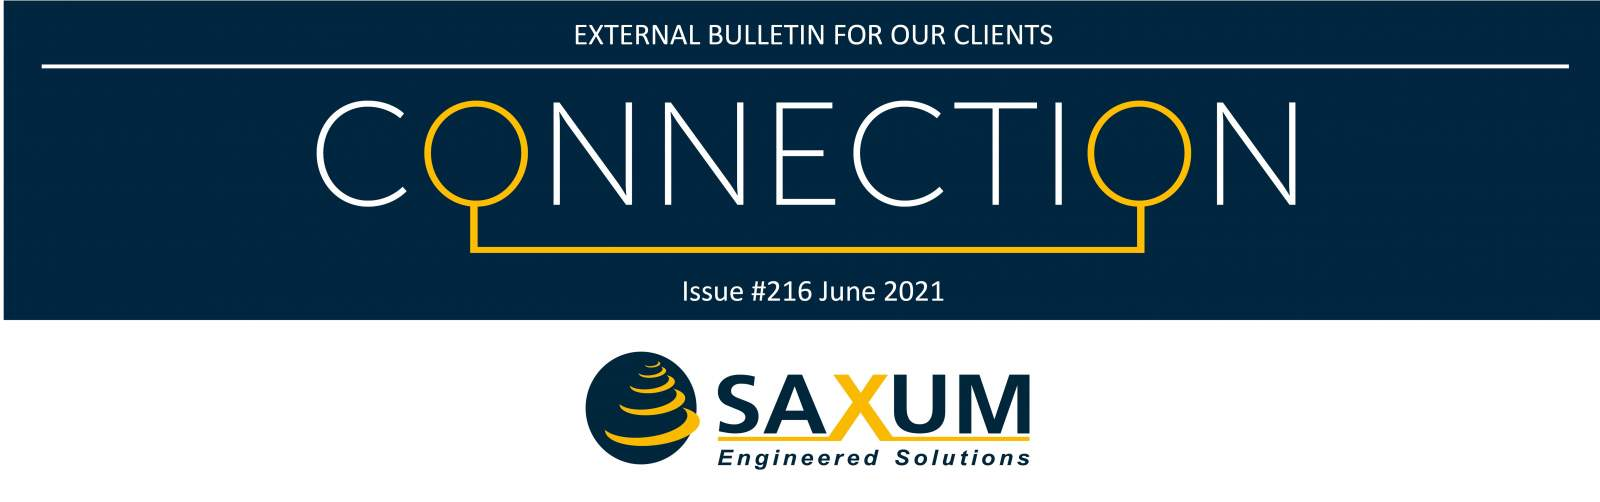 SAXUM Connection #211